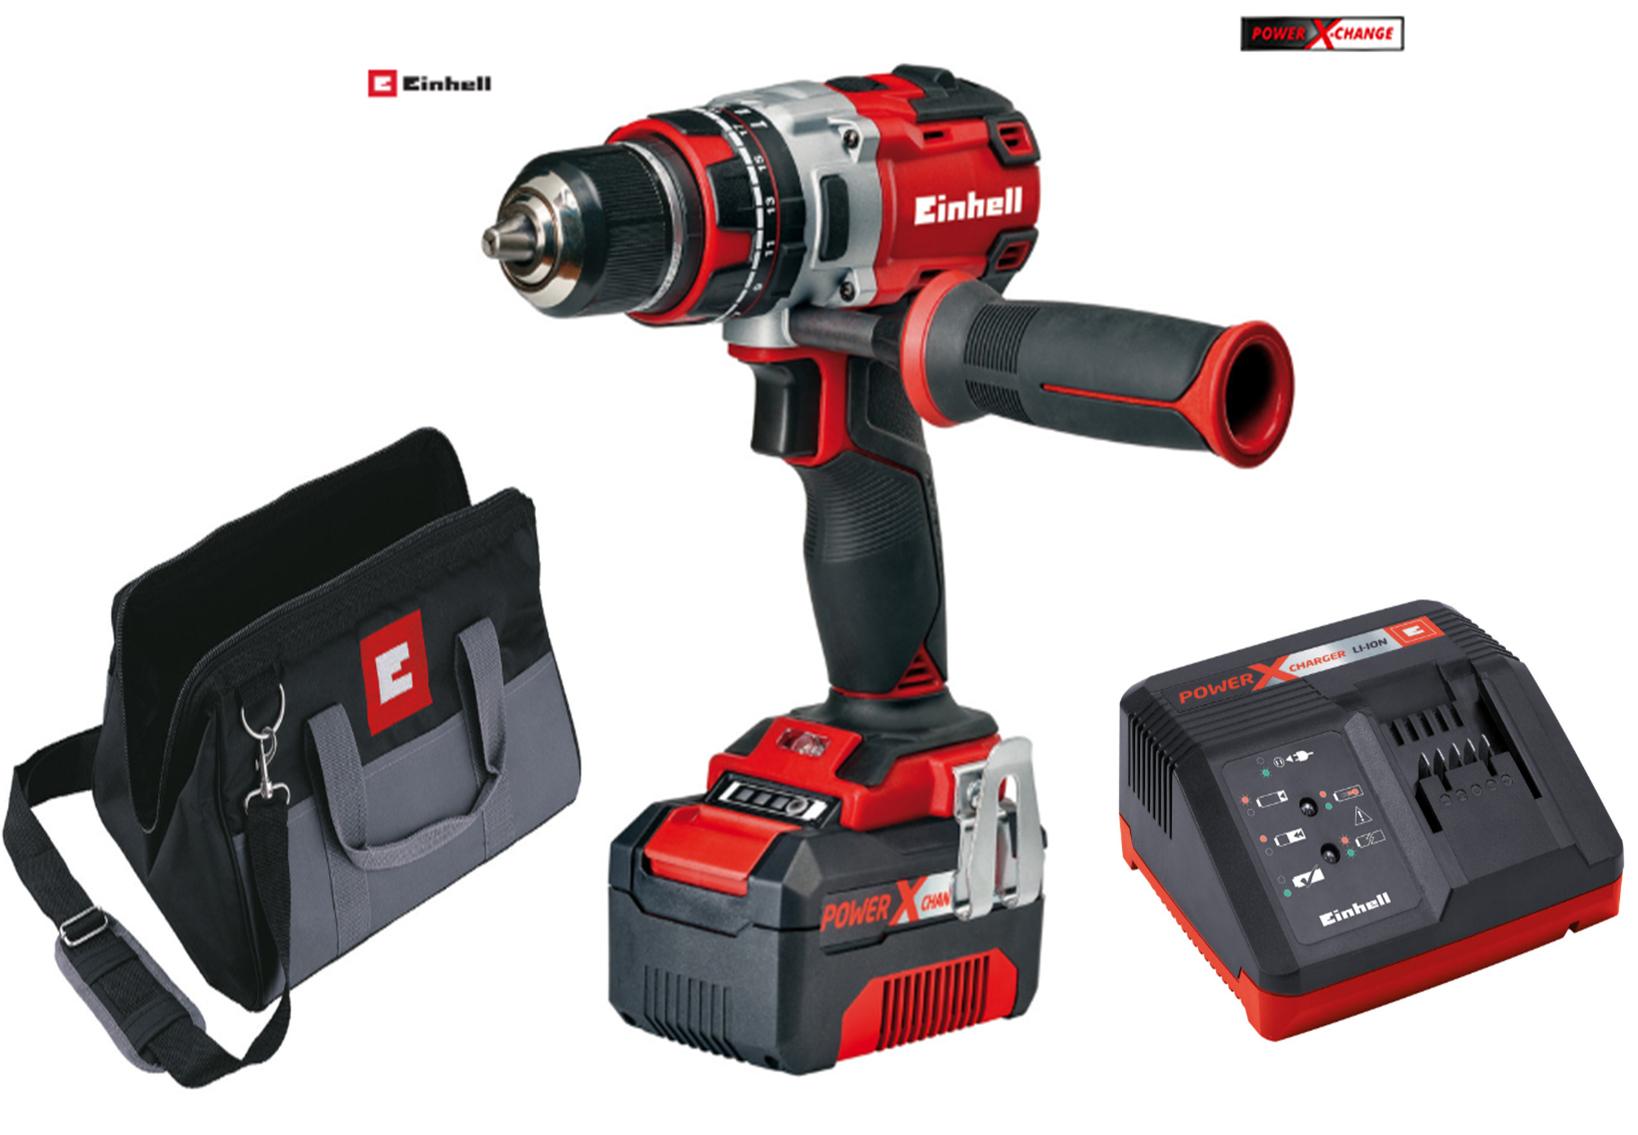 Einhell PXC TE CD18Li-I BL Power X-Change 18V Li-Ion Cordless Brushless Combi Drill 1 x 4.0Ah battery - £89.98 delivered @ Tootlstation